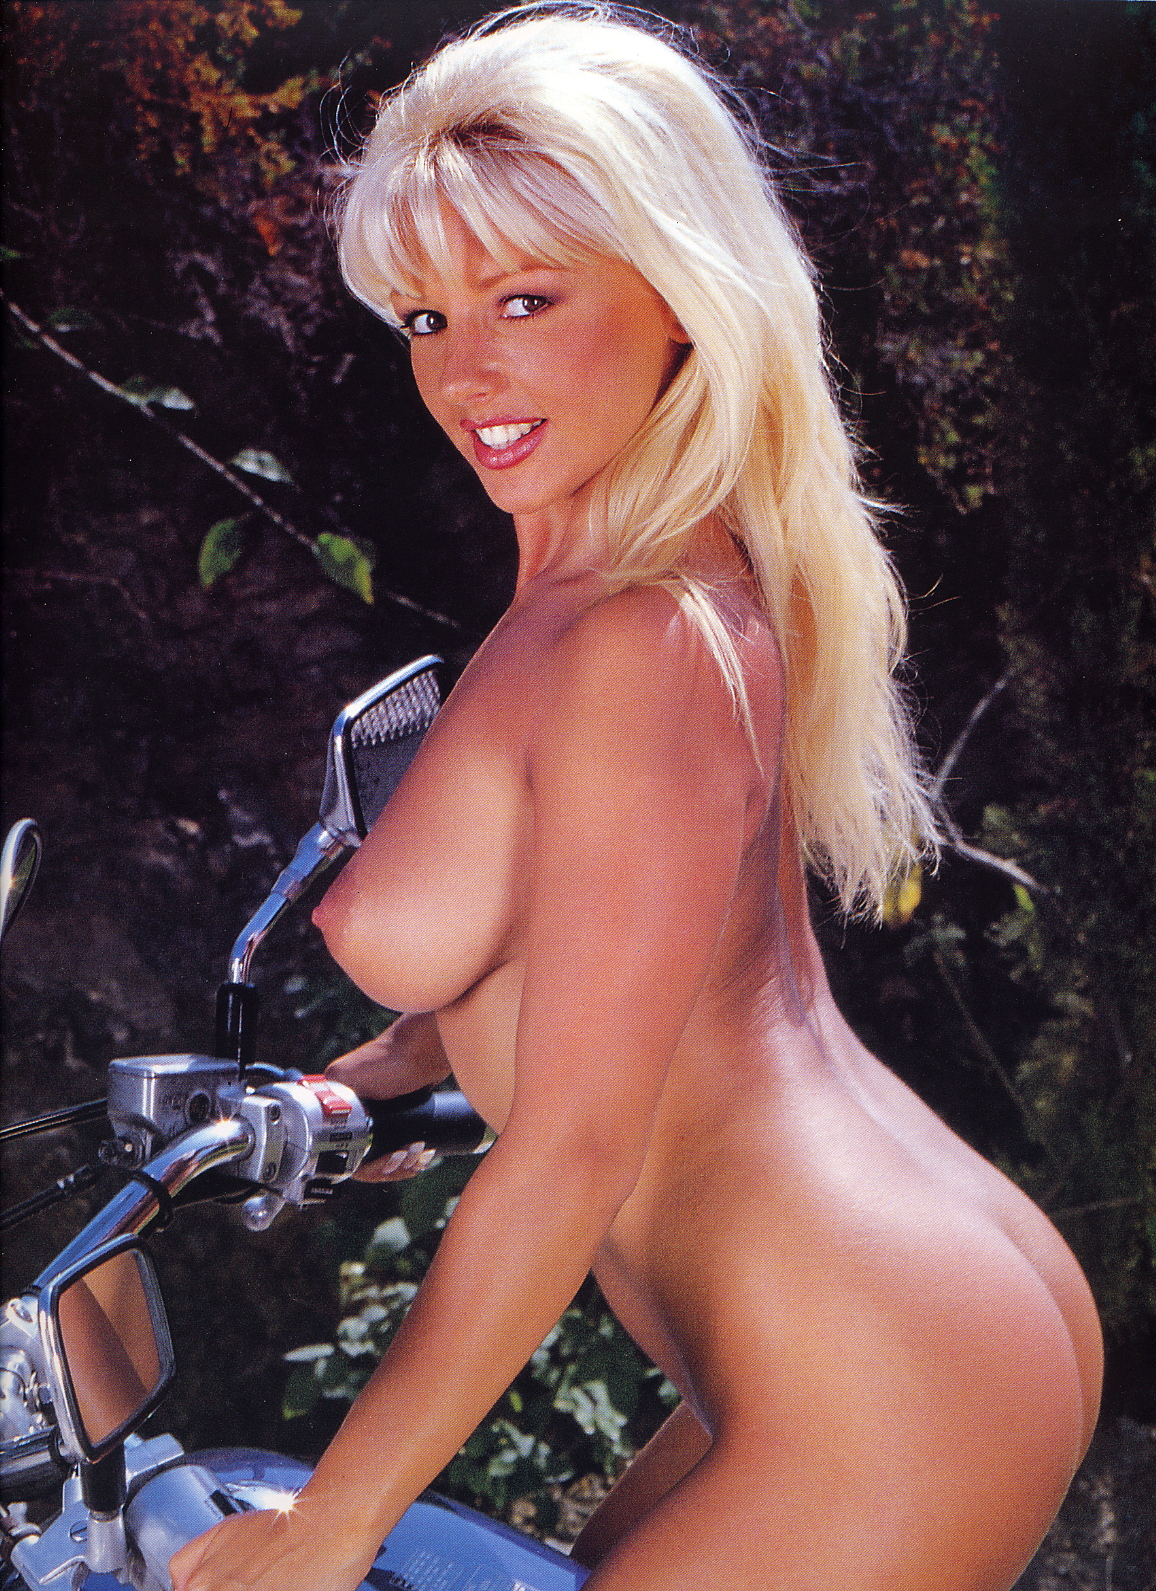 karen white nude gallery